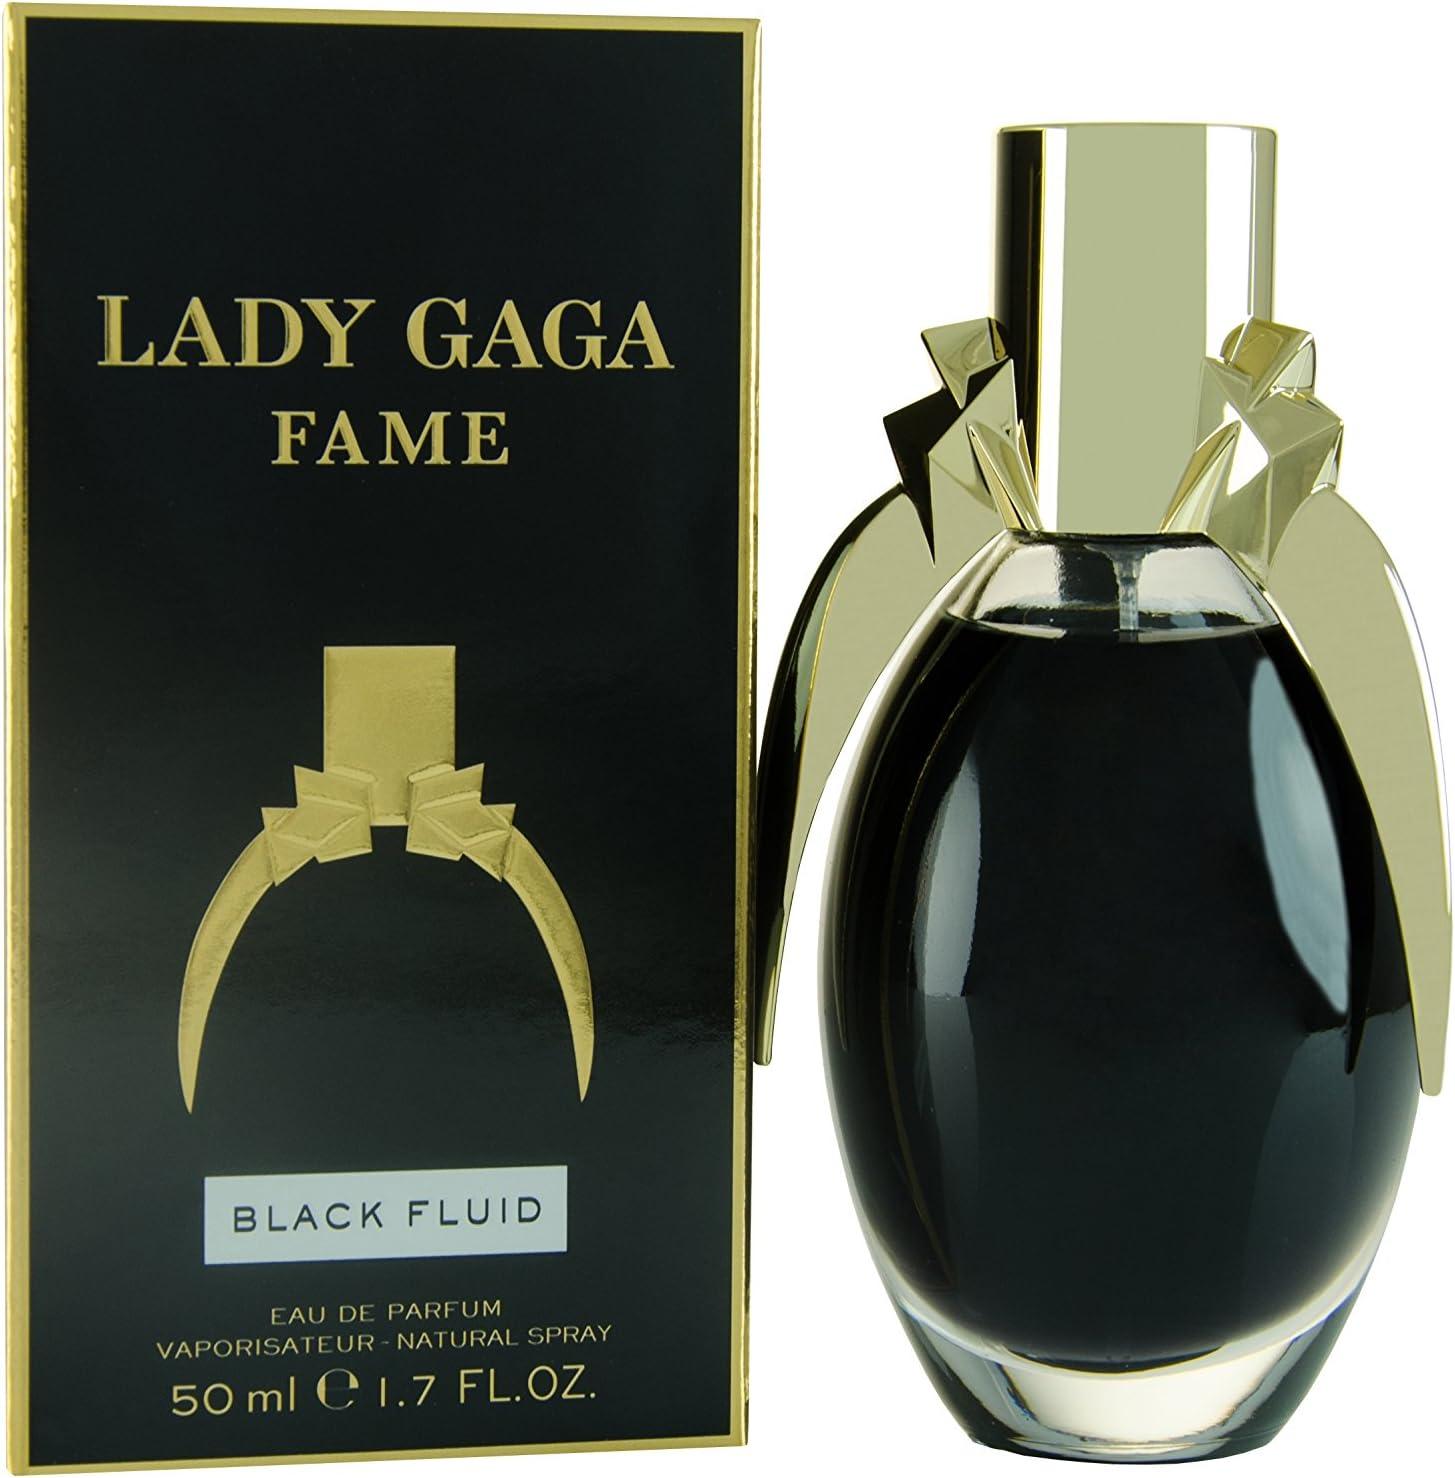 Lady Gaga Fame Eau De Parfum 50ml, £9